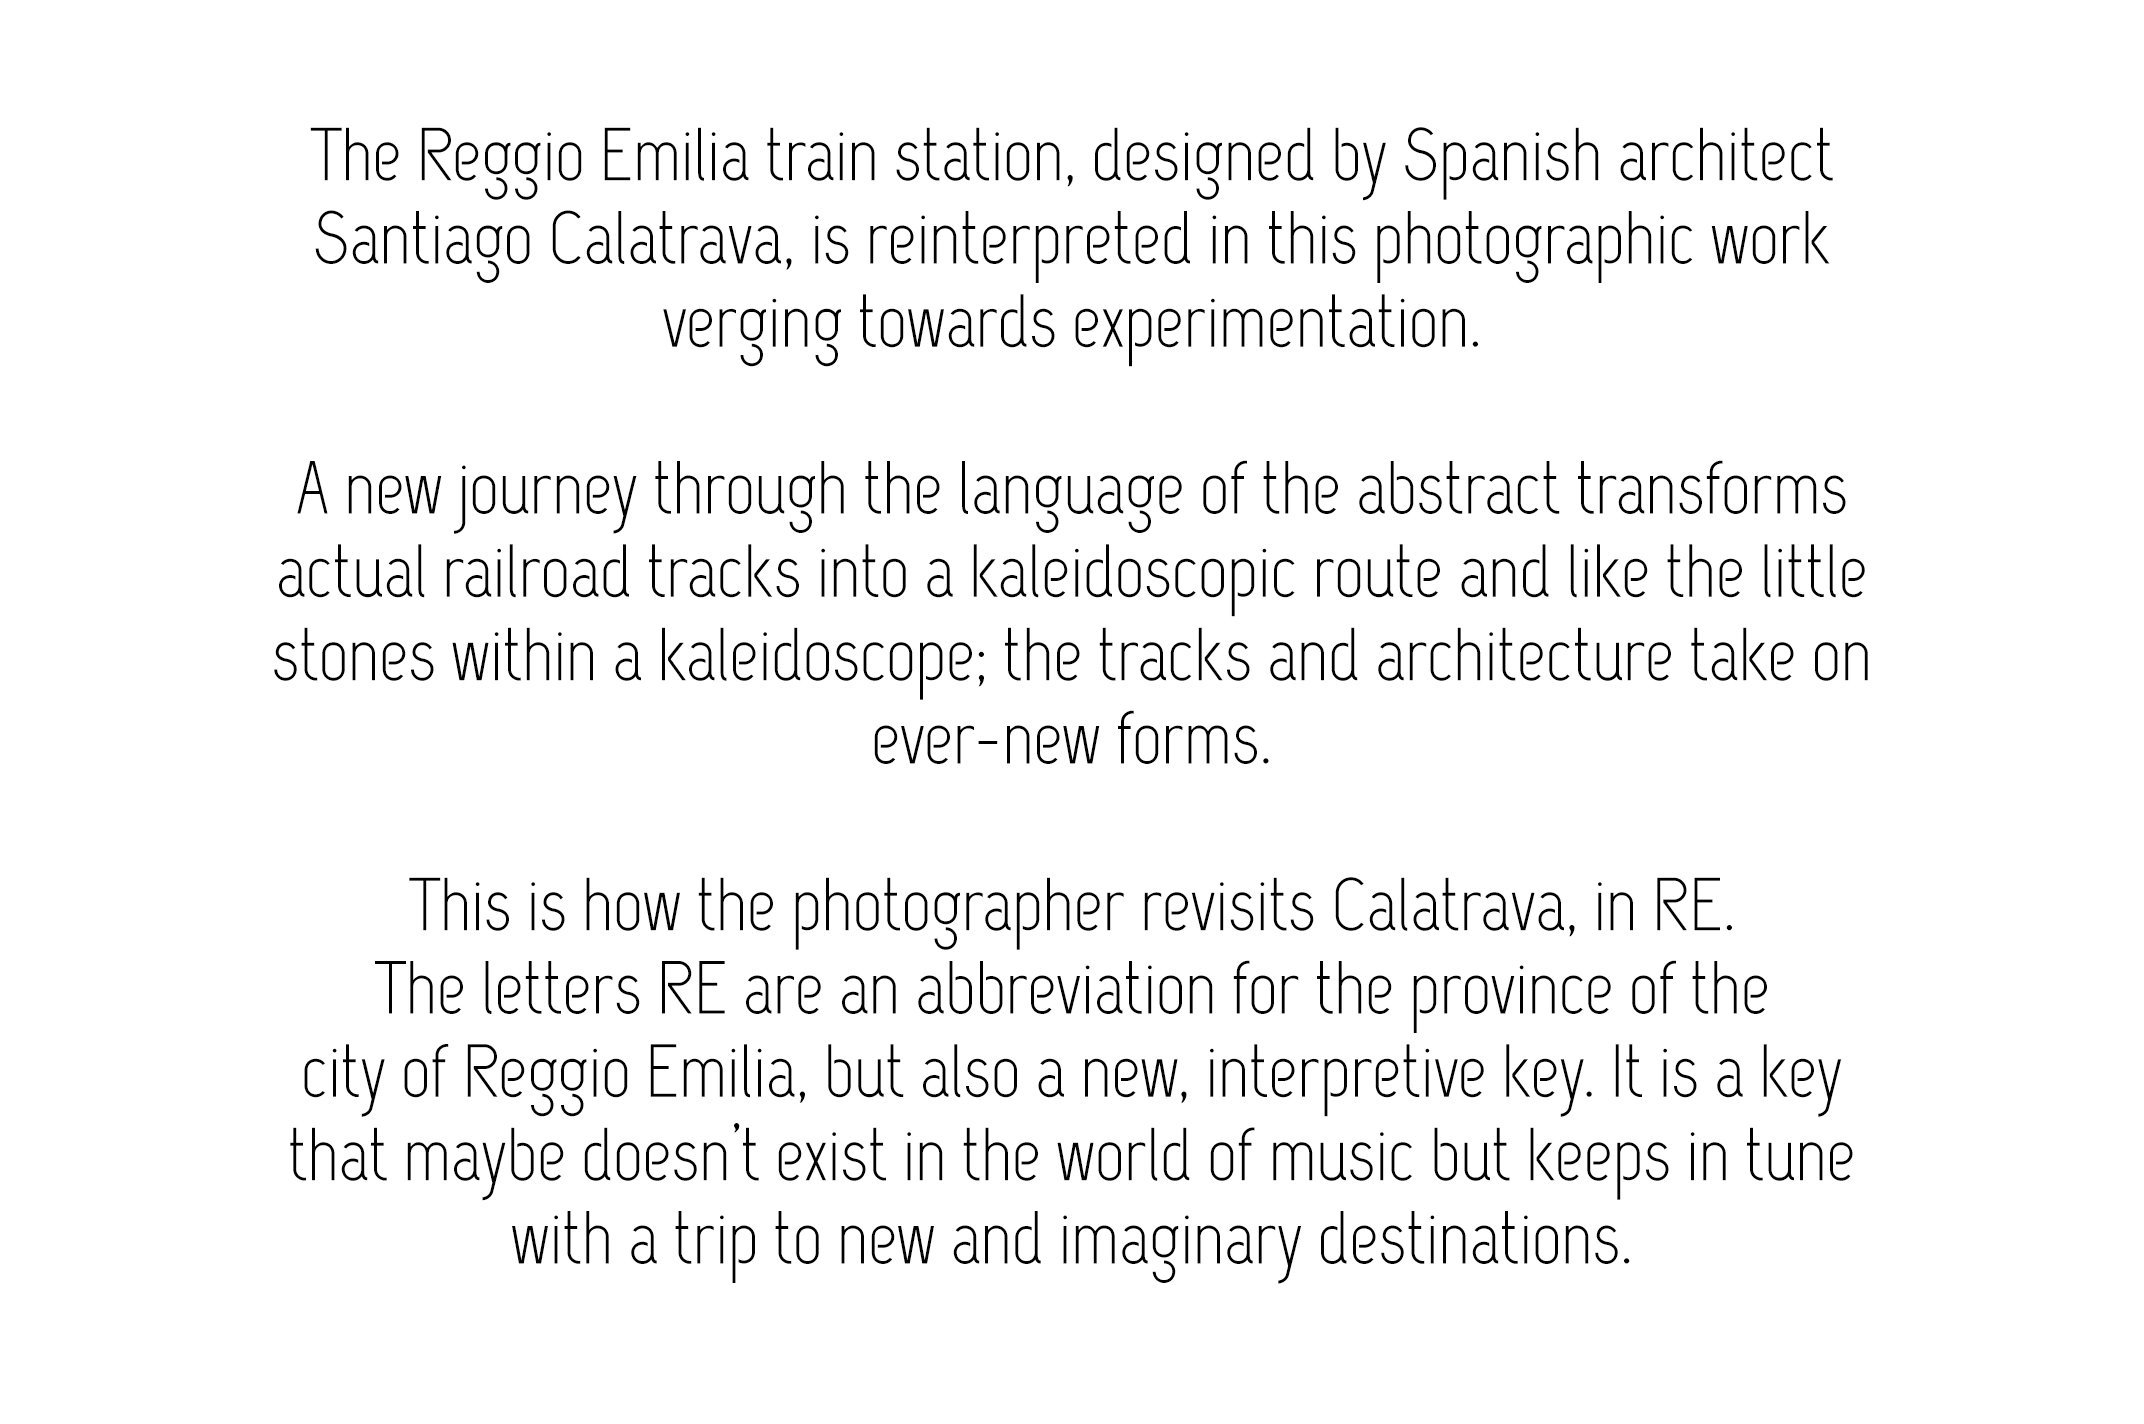 001_intro_Revisiting Calatrava in RE_1.jpg